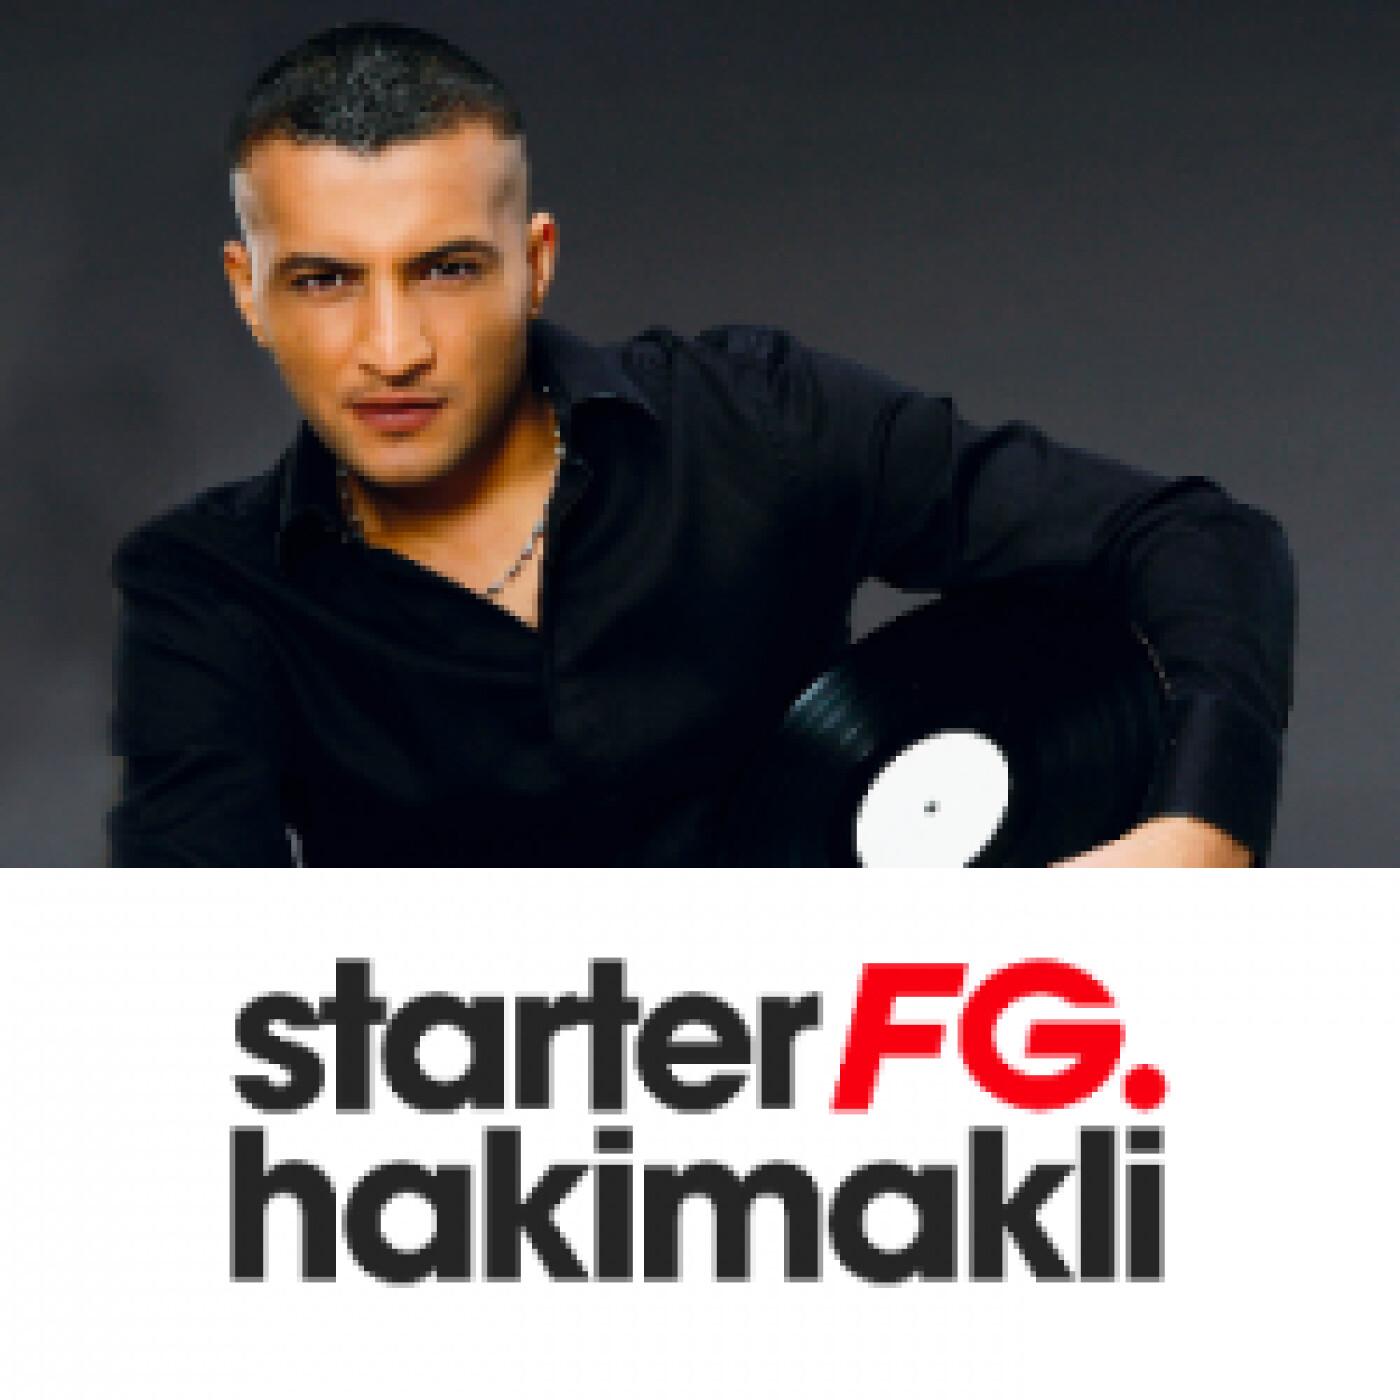 STARTER FG BY HAKIMAKLI MERCREDI 12 MAI 2021